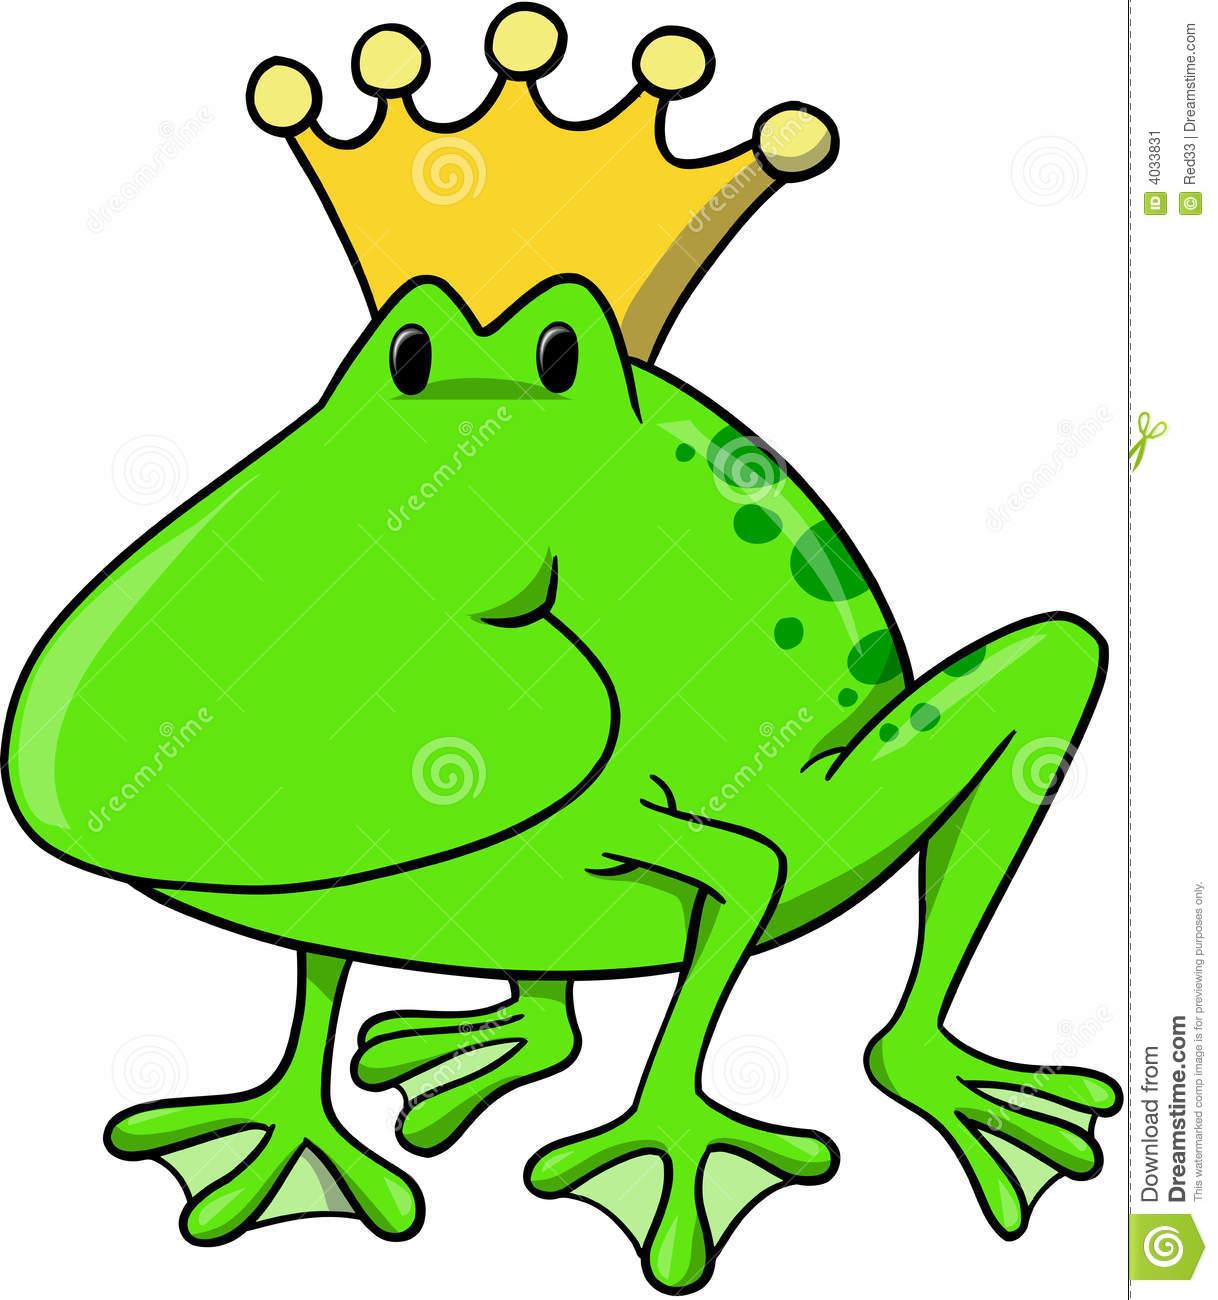 Frog King Vector Illustration Stock Image.